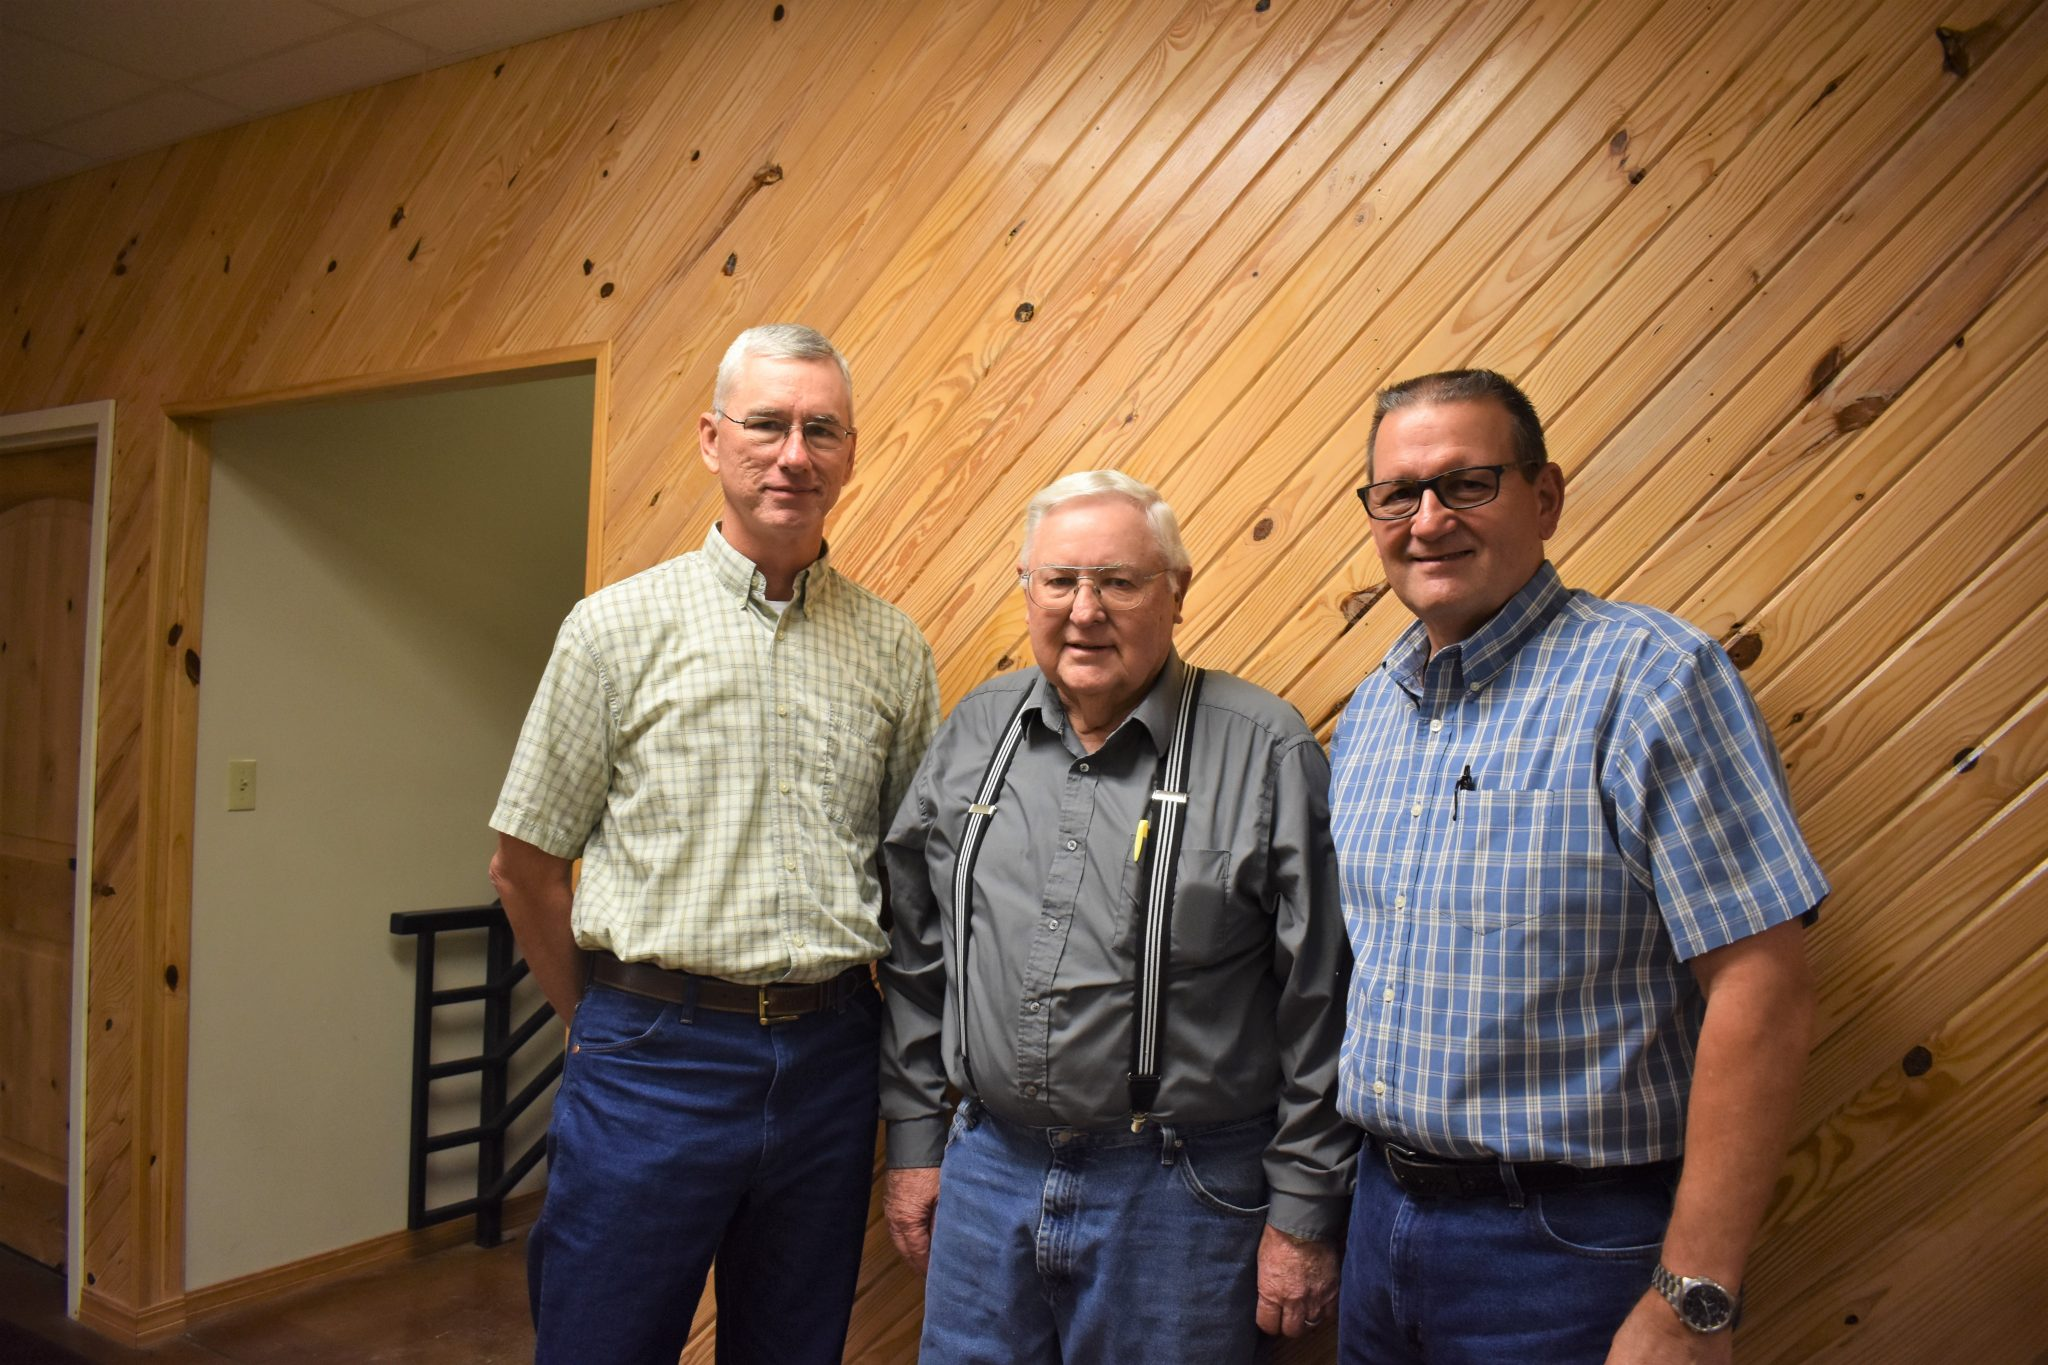 Church Elders Mark Roberson, James McEachern, Denny Hokit